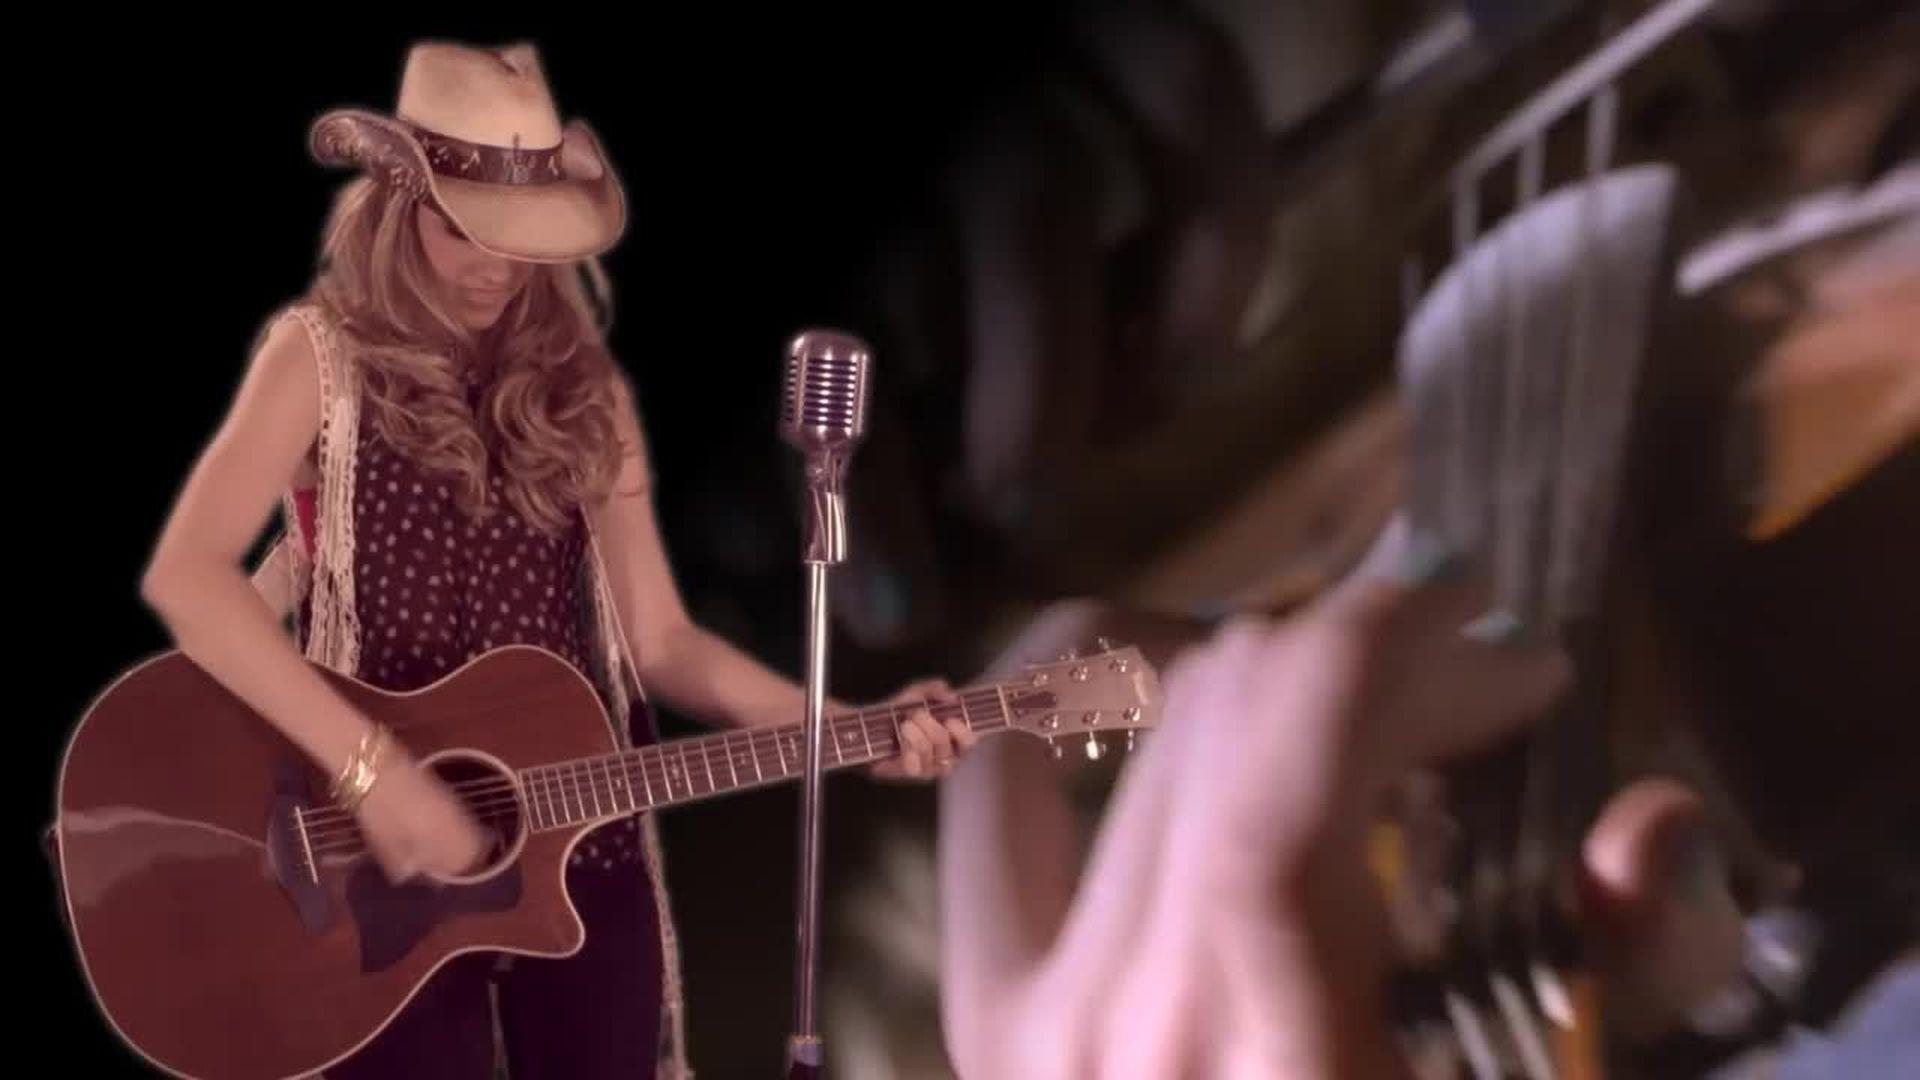 Midnight Muddin - ORIGINAL by Maggie Baugh - OFFICIAL VIDEO